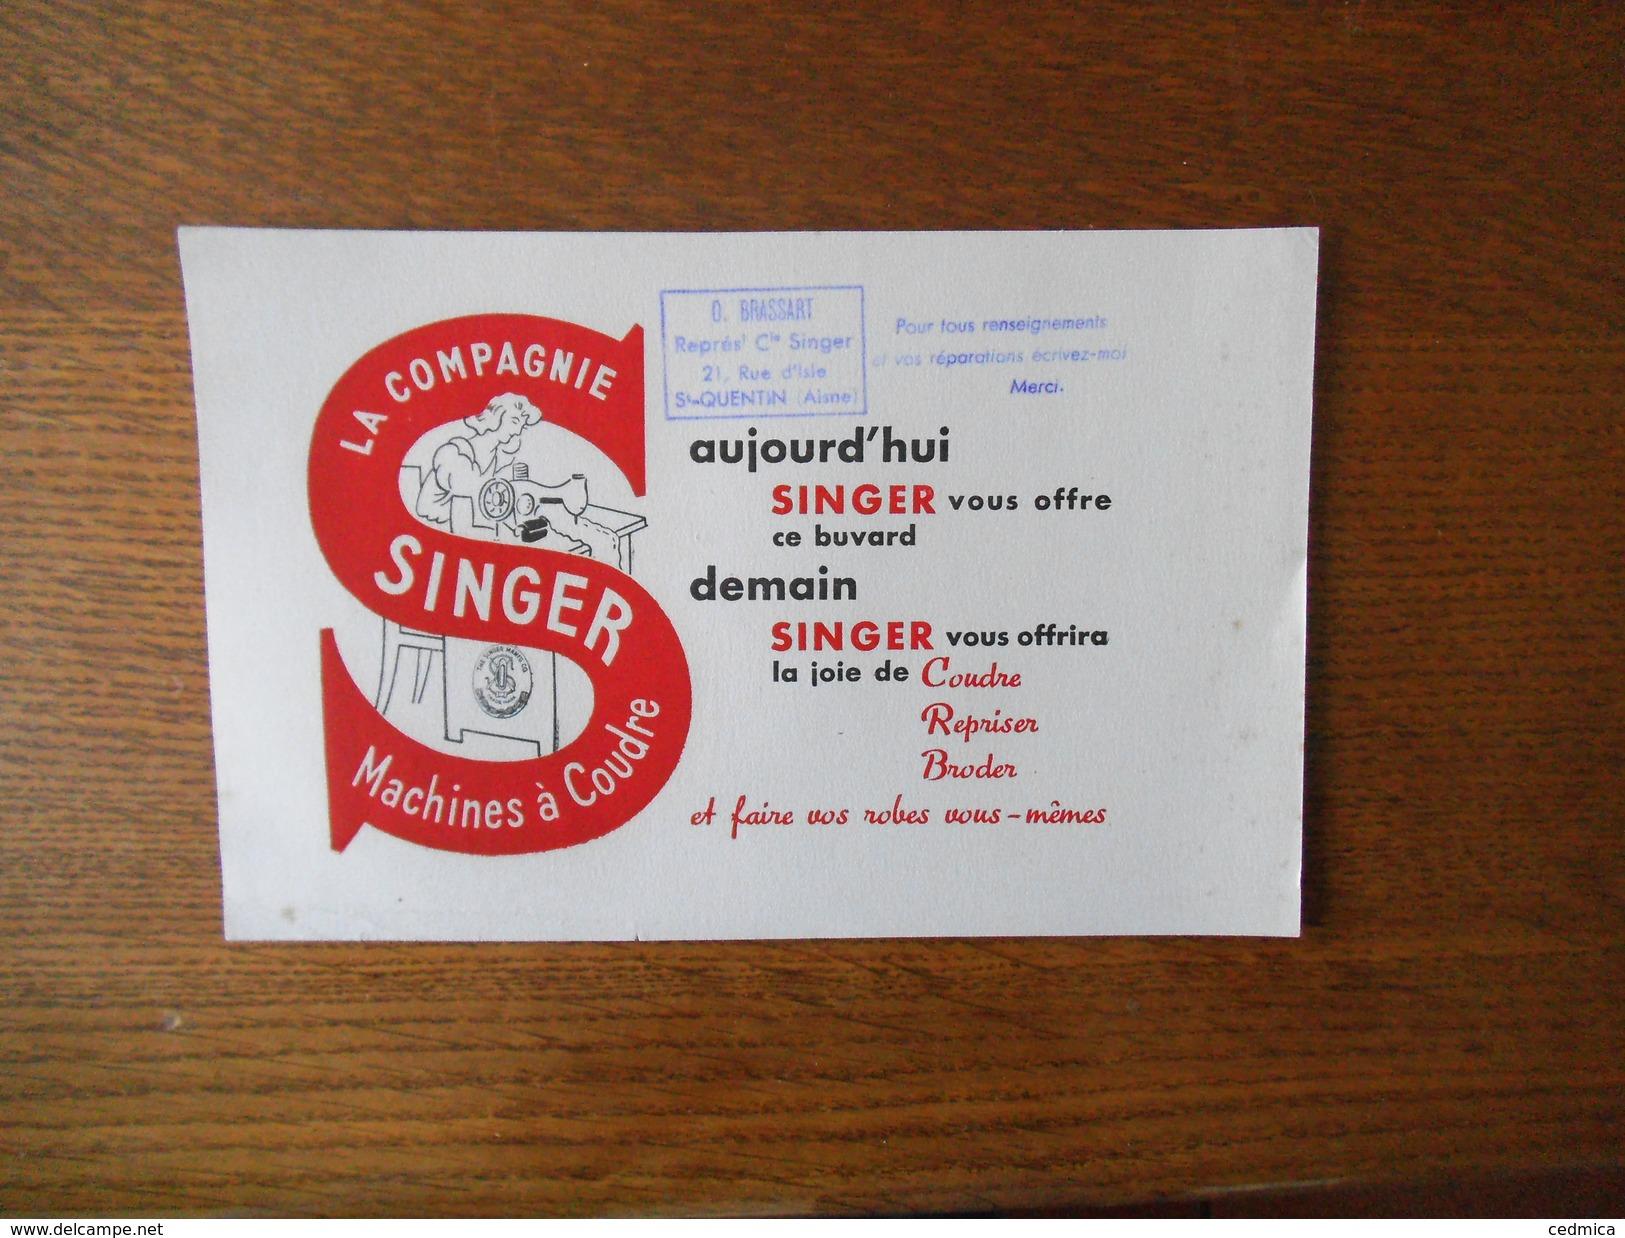 SINGER MACHINES A COUDRE O. BRASSART REPRESENTANT Cie SINGER 21 RUE D'ISLE SAINT-QUENTIN AISNE - S